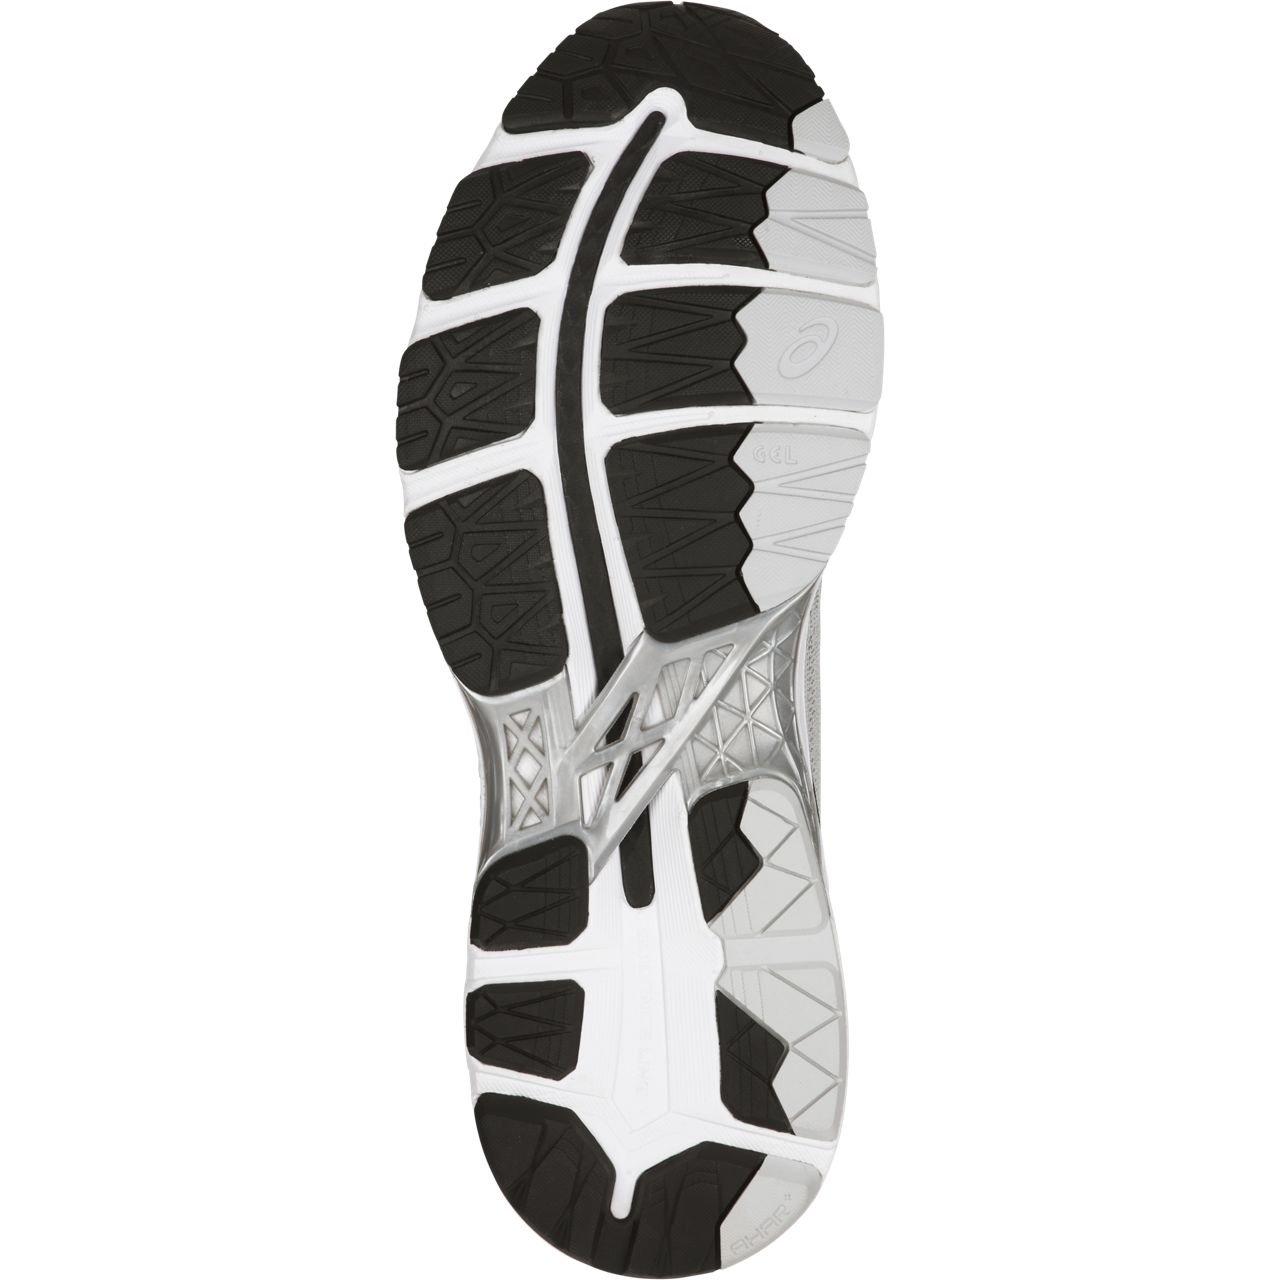 ASICS Mens Gel-Kayano 24 Running Shoe, Silver/Black/Mid Grey, 6 Medium US by ASICS (Image #5)